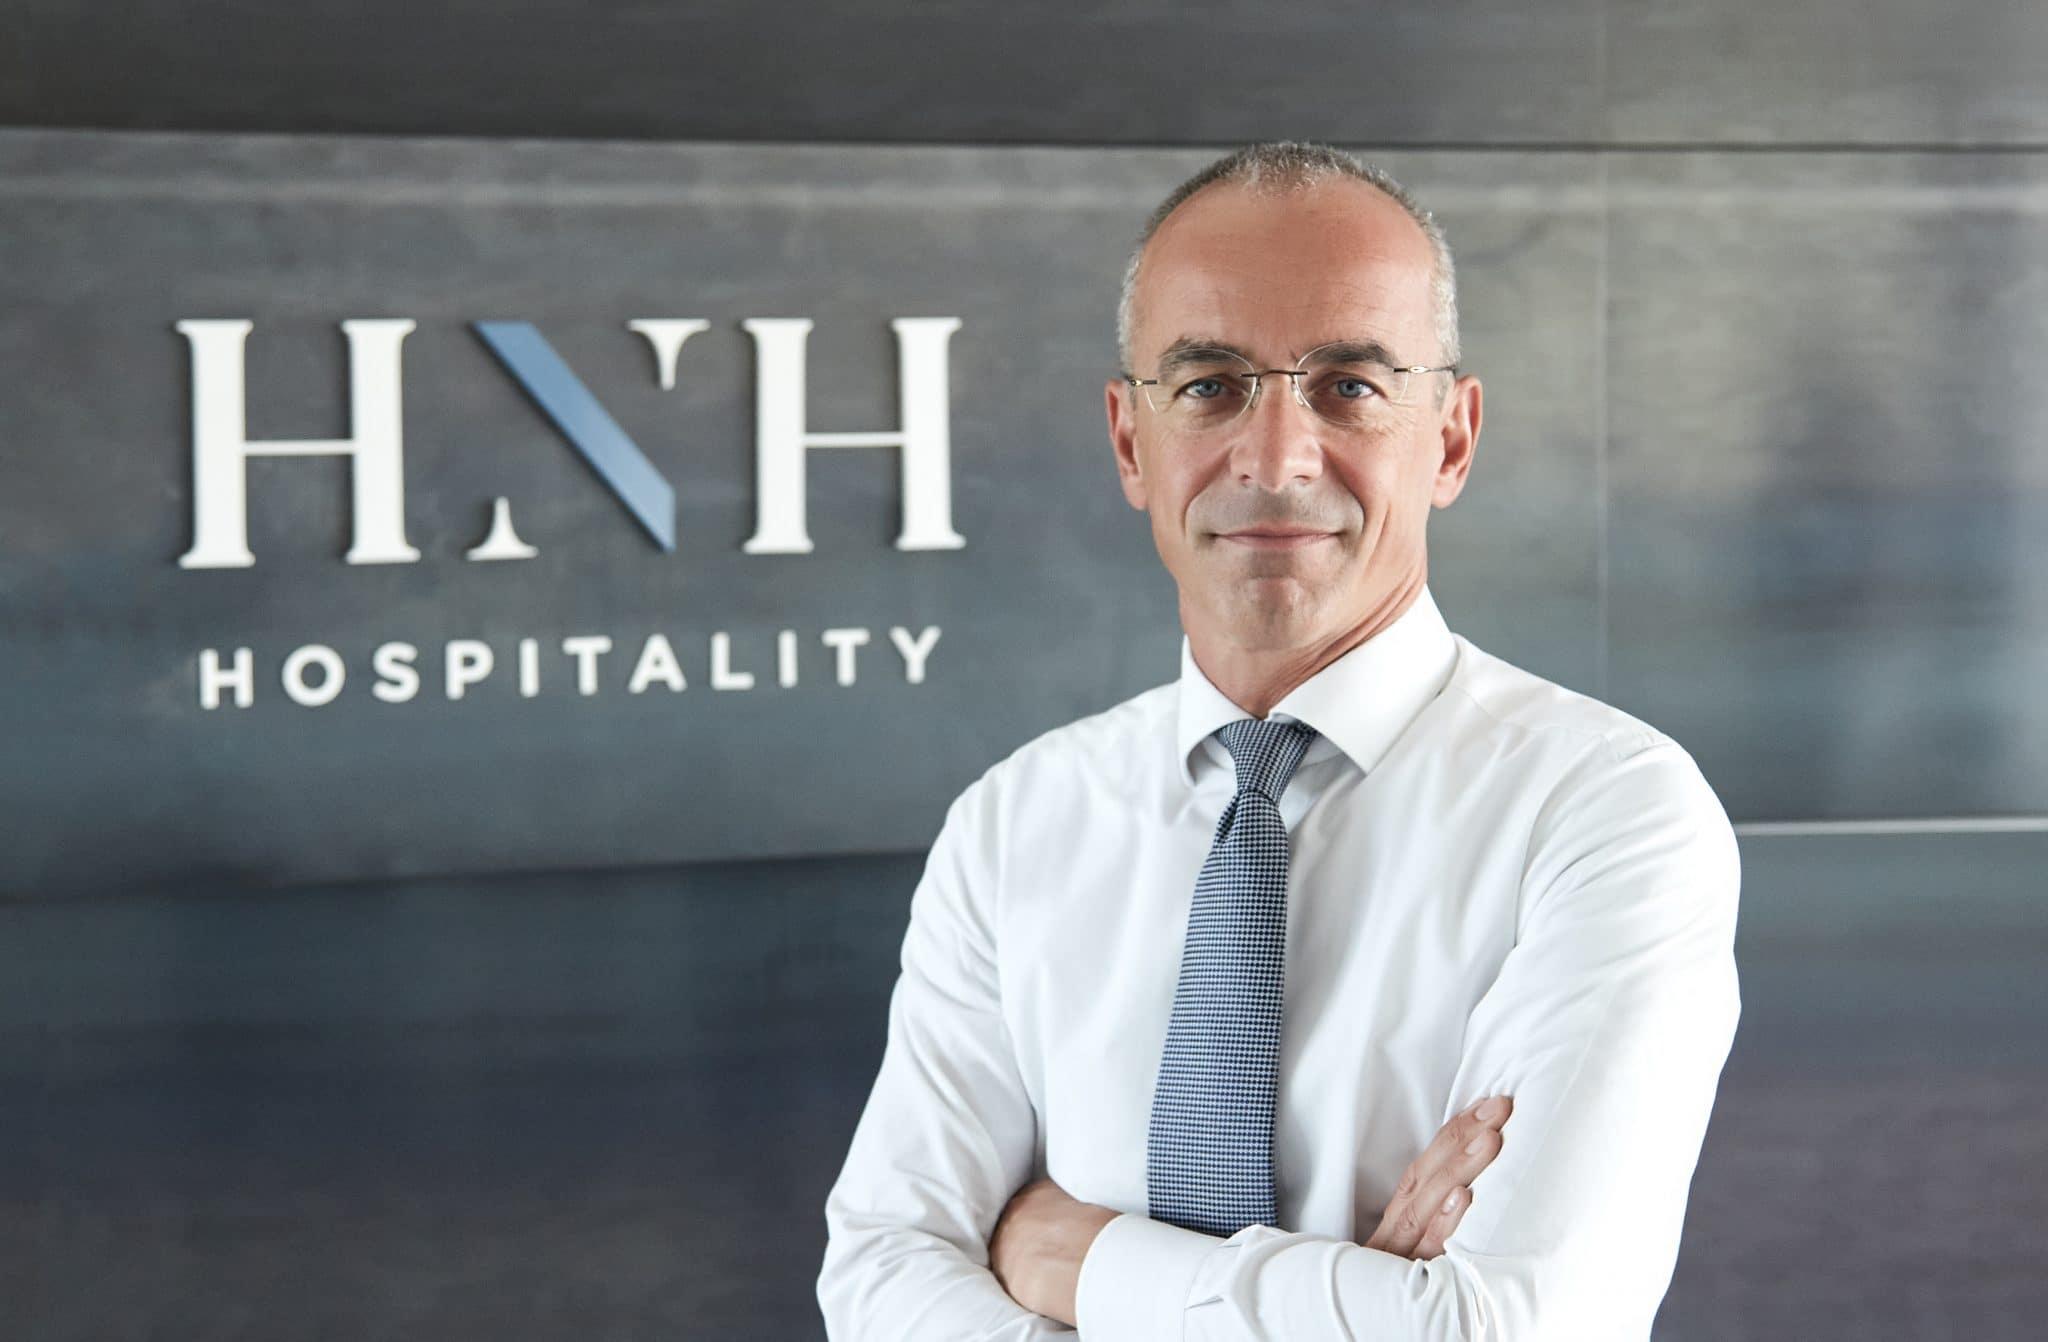 Luca-Boccato-HNH-Hospitality